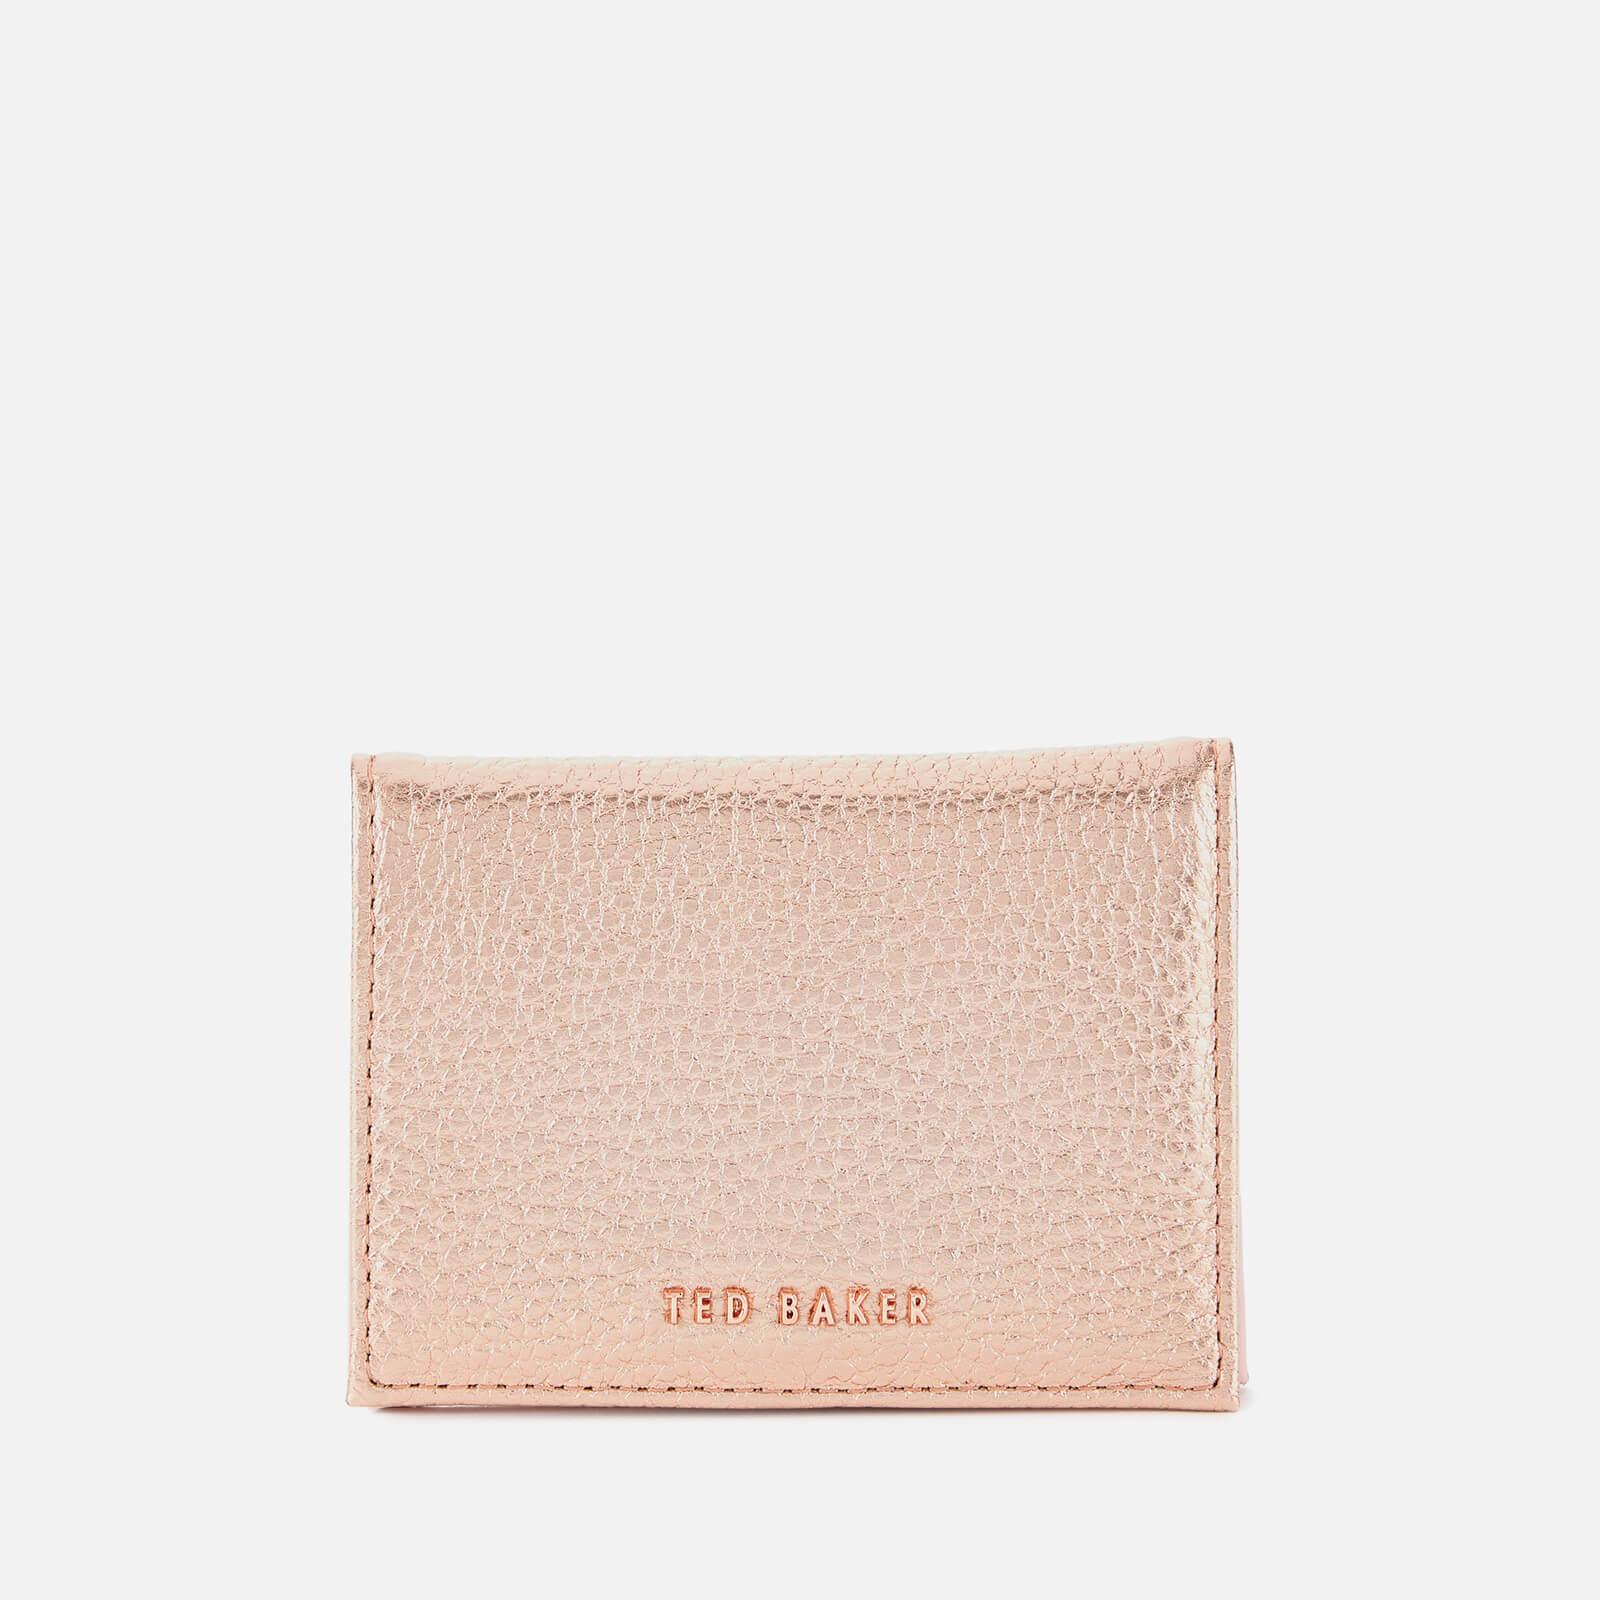 Ted Baker Women's Fayi Textured Oyster Card Holder - Rosegold